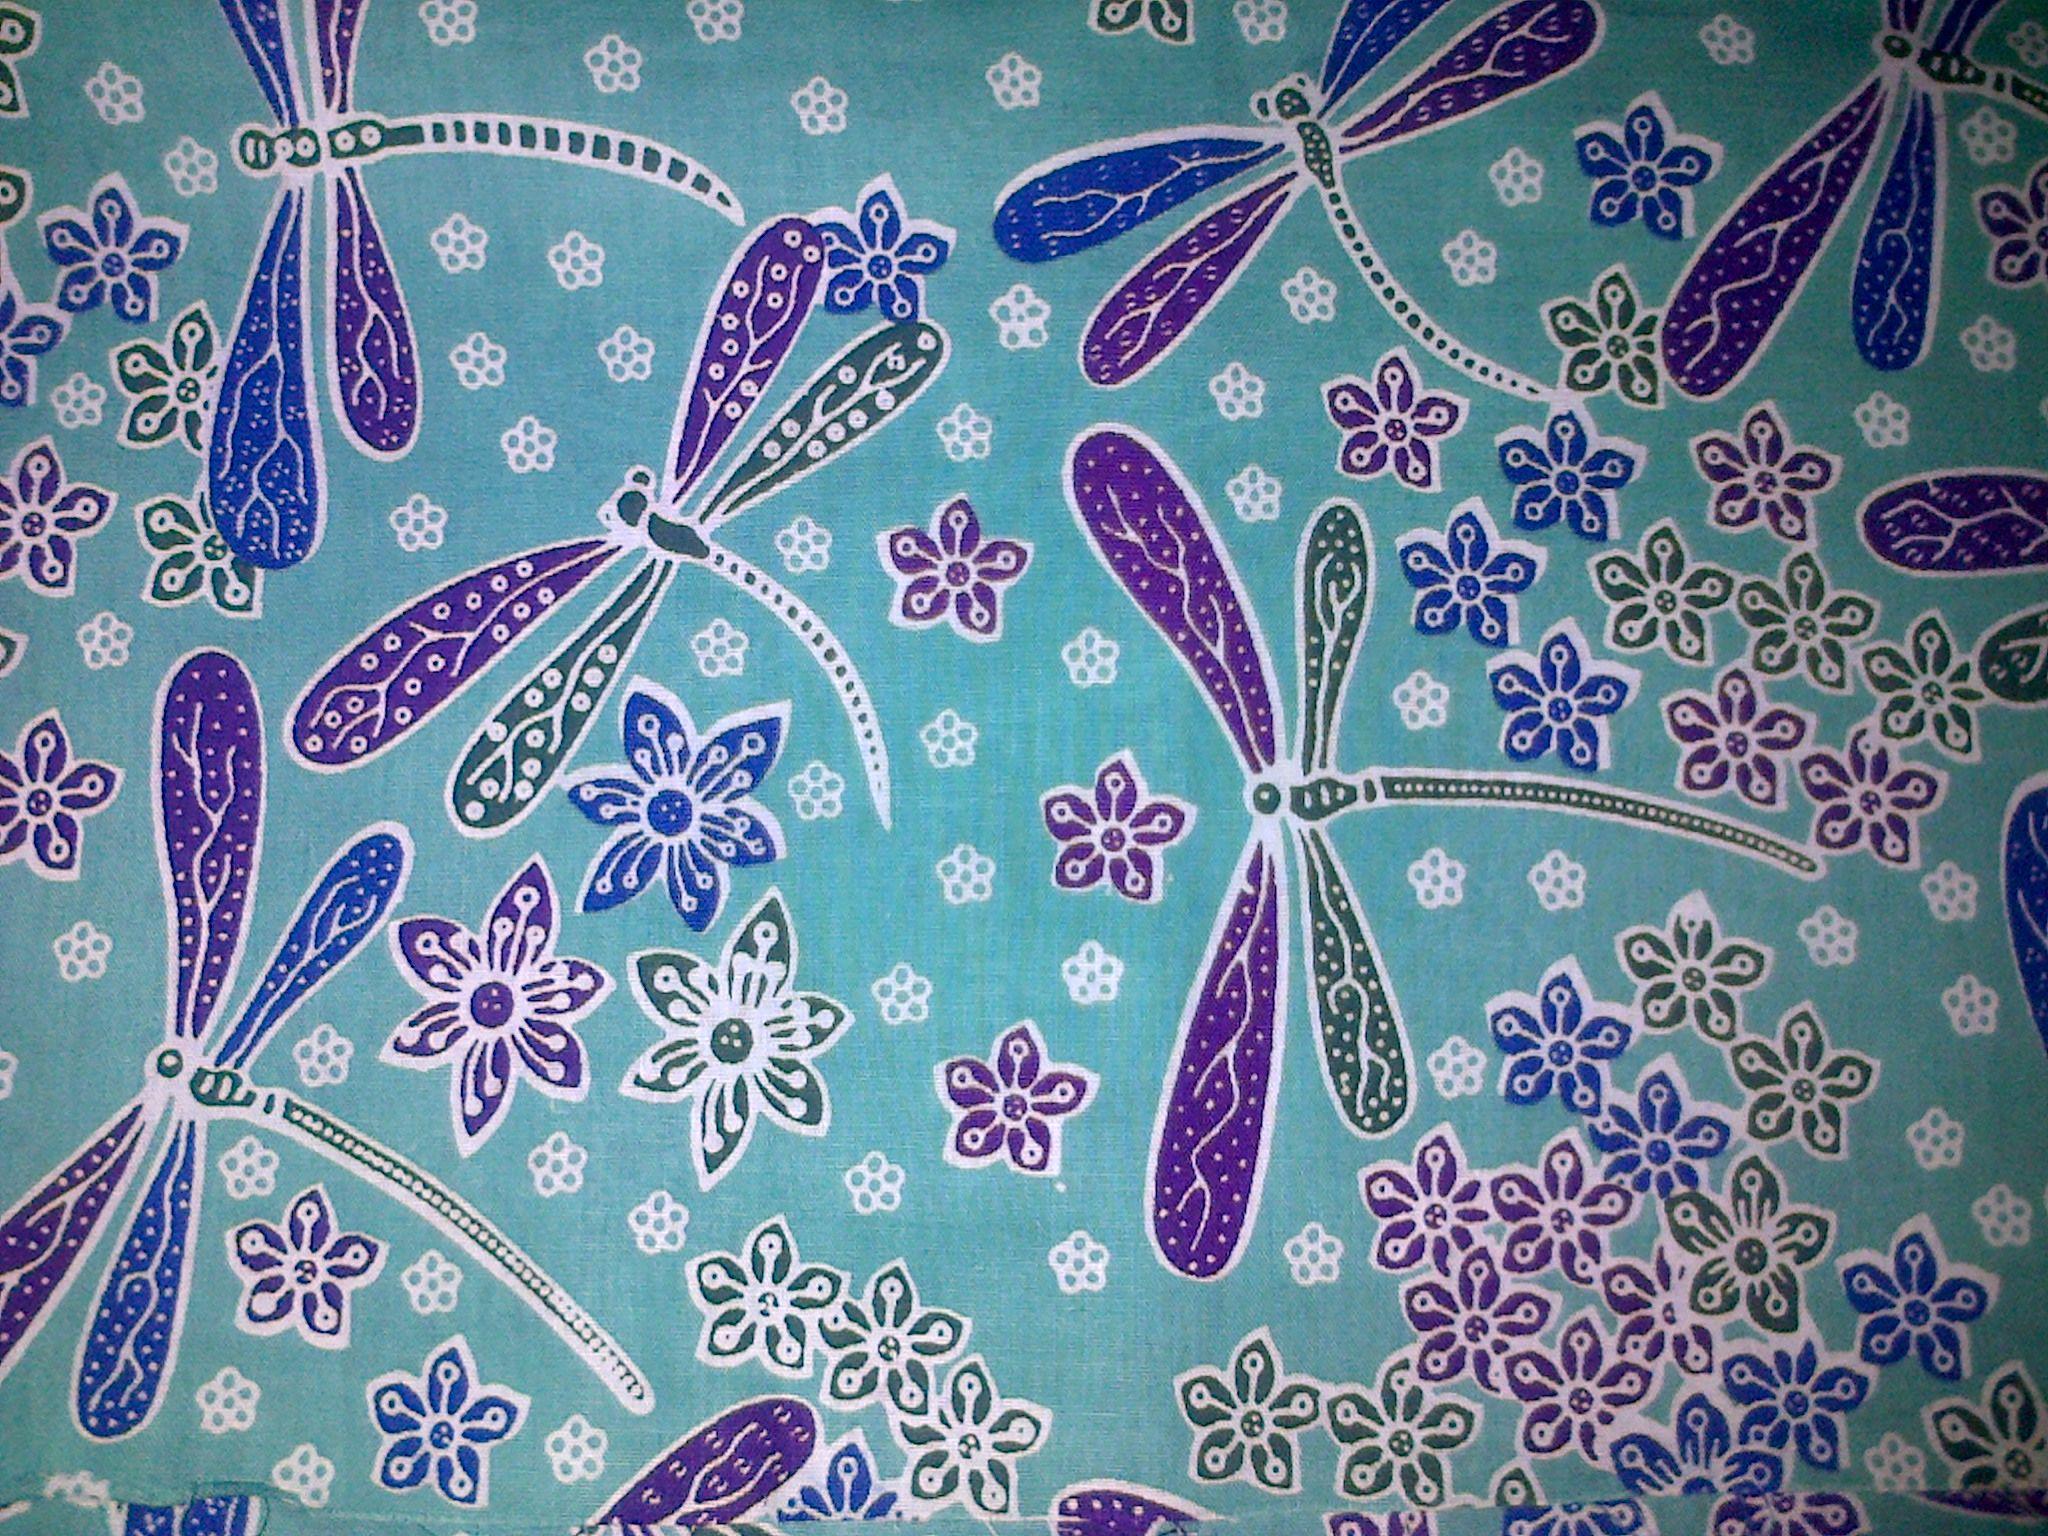 Batik pekalongan motif capung biru muda